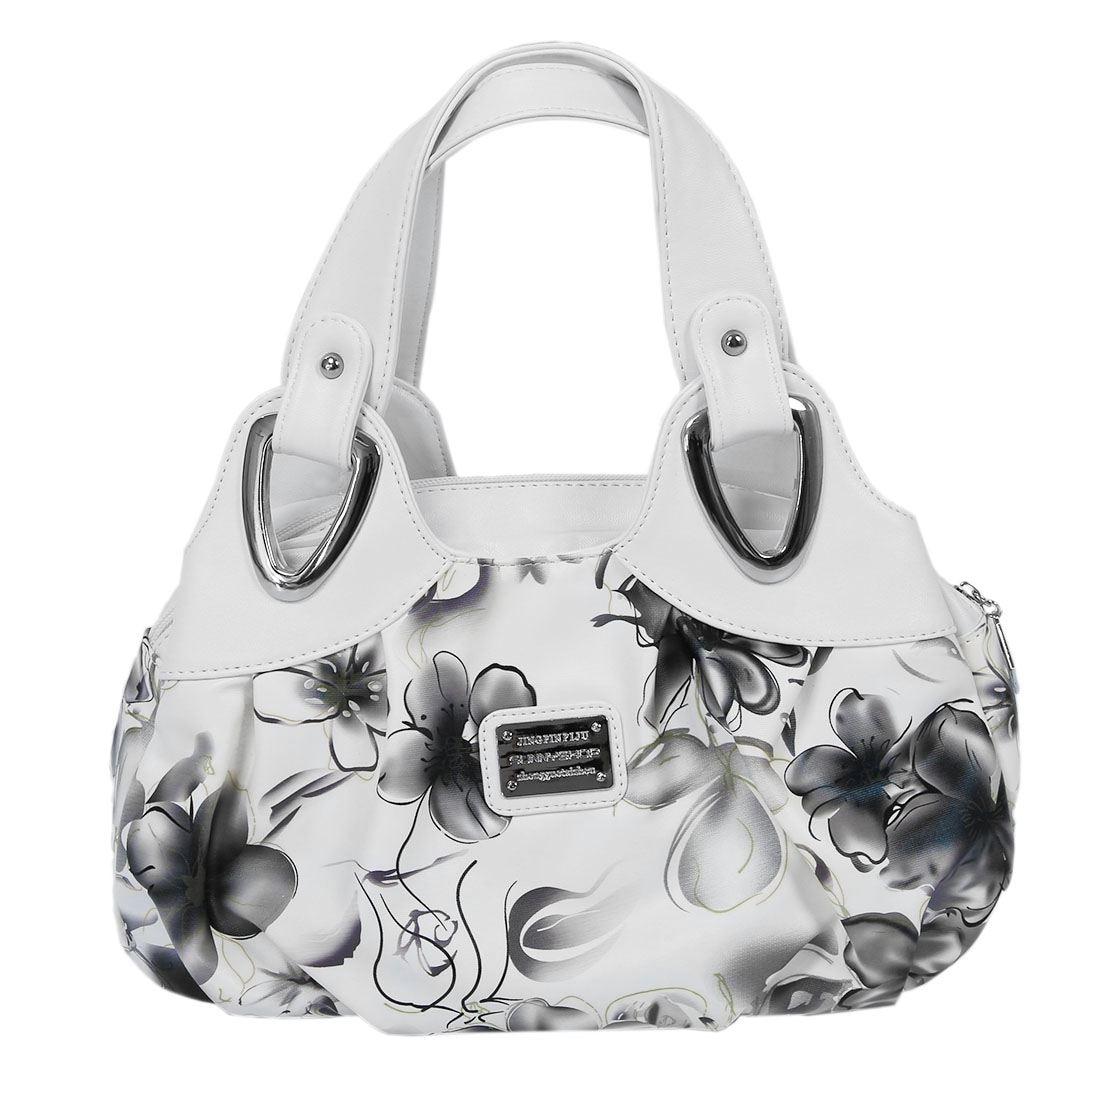 Fashion handbag Women PU leather Bag Tote Bag Printing Handbags Satchel -Ink gray flower + white HandstrapFashion handbag Women PU leather Bag Tote Bag Printing Handbags Satchel -Ink gray flower + white Handstrap